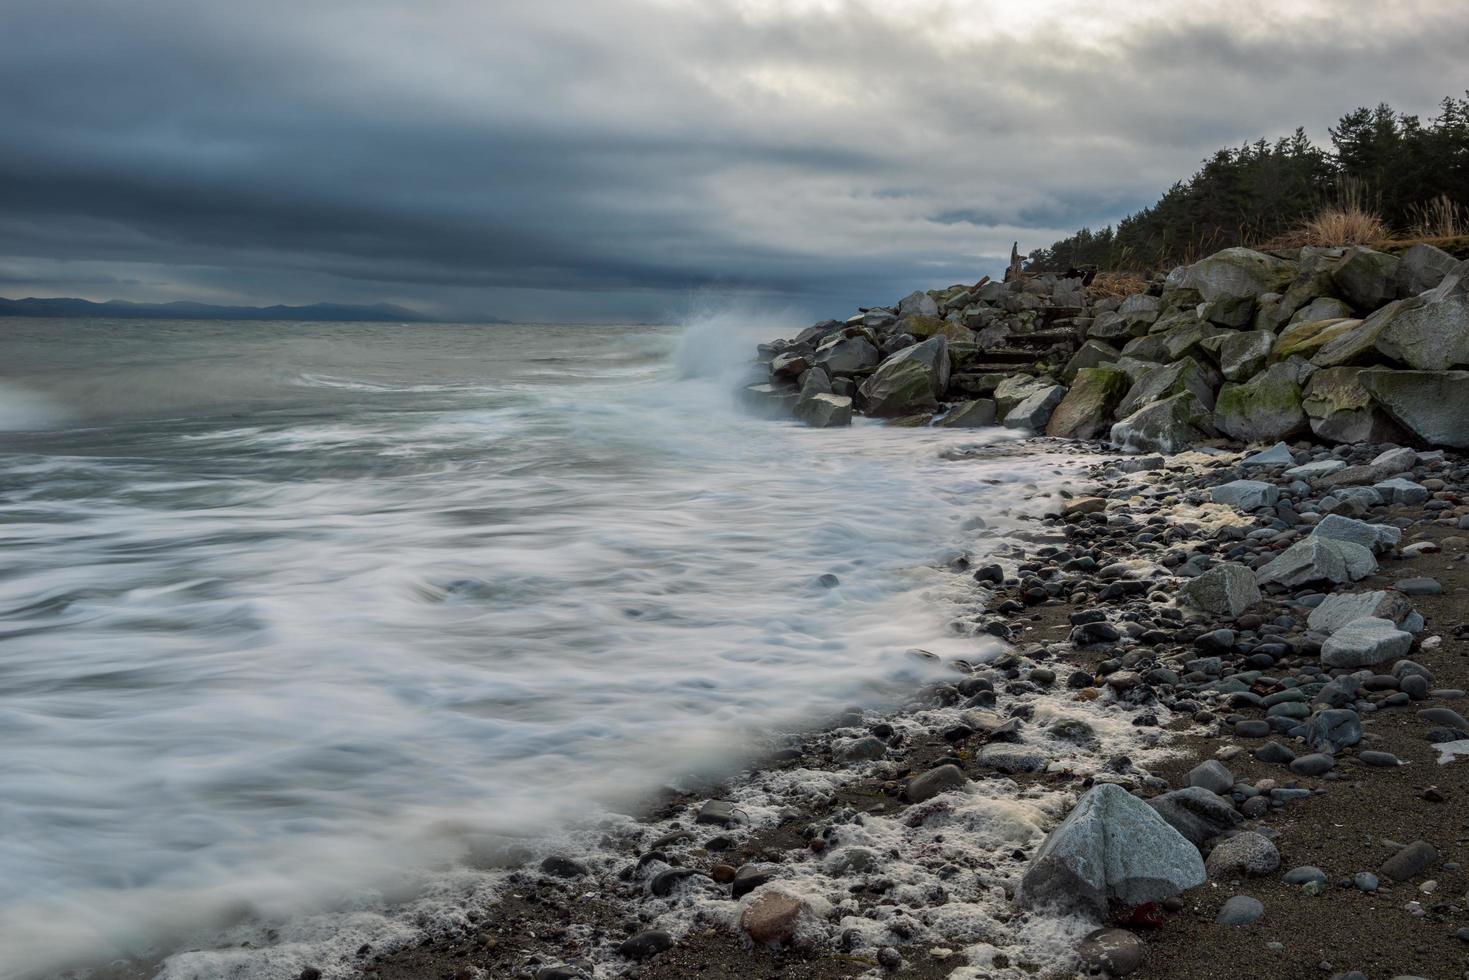 stenig strand under molnig himmel foto